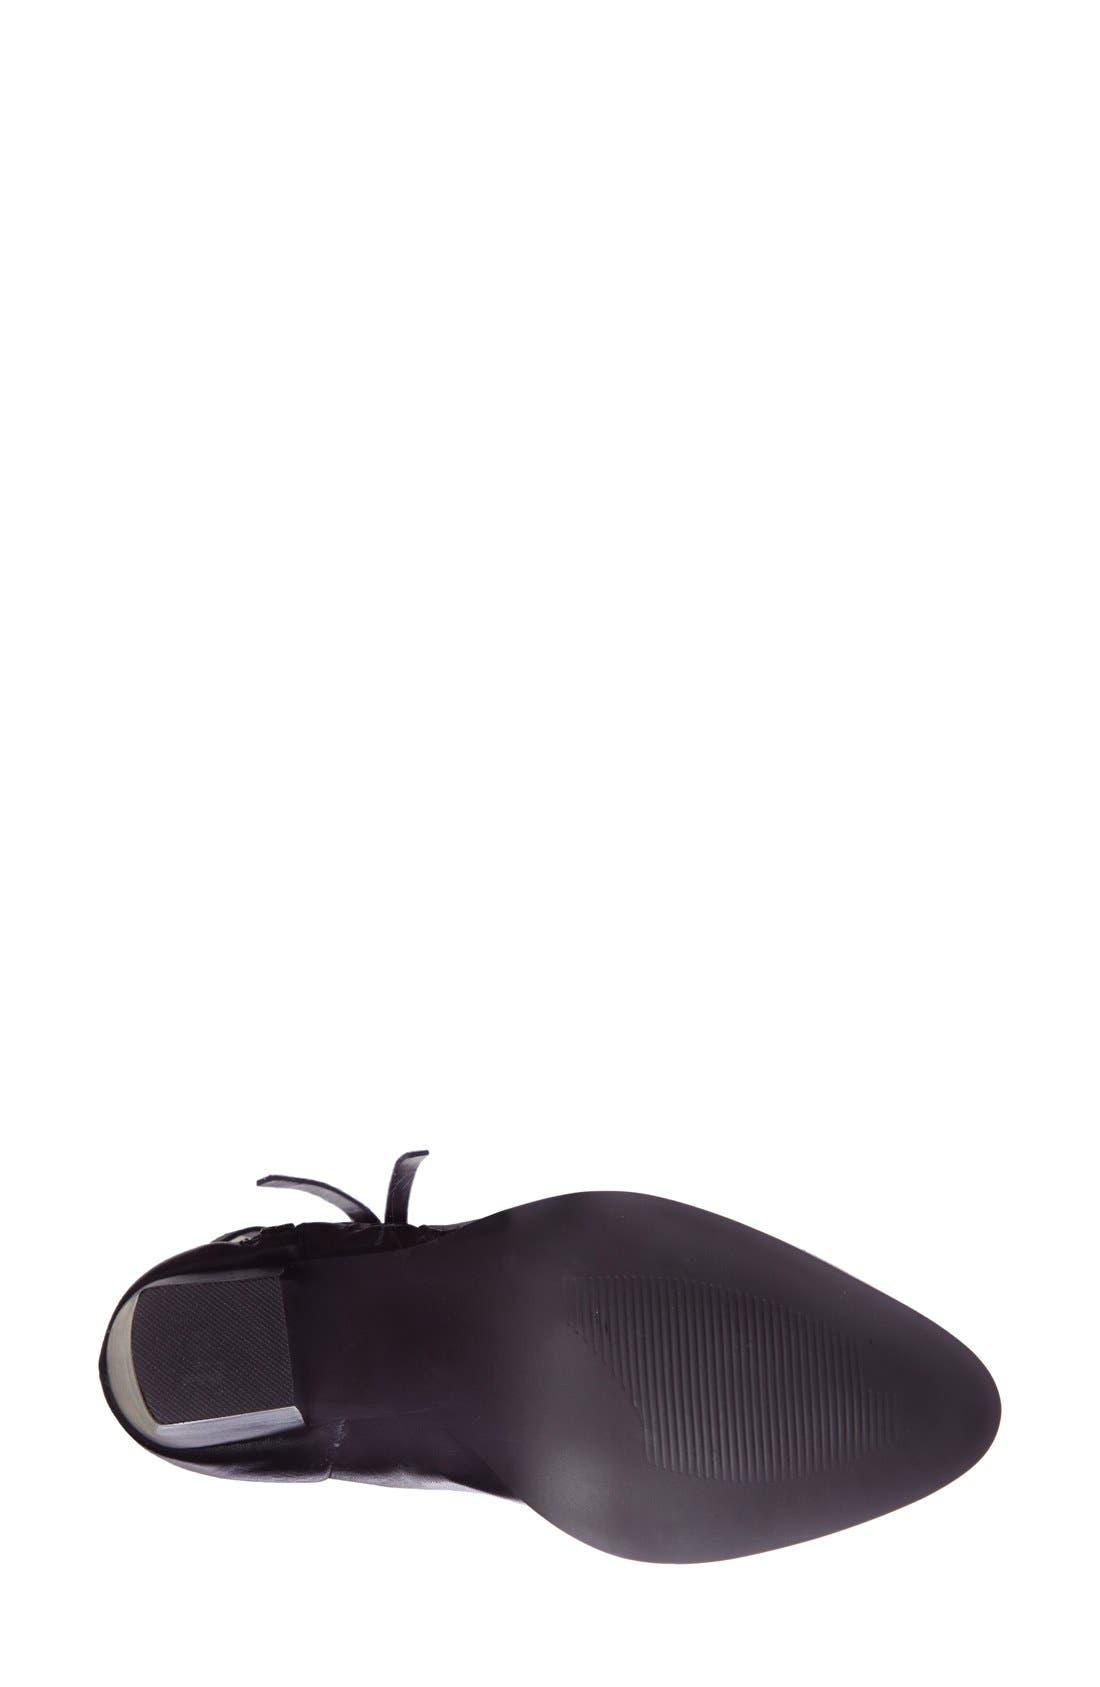 Alternate Image 4  - Steve Madden 'Marando' Pointy Toe Leather Bootie (Women)